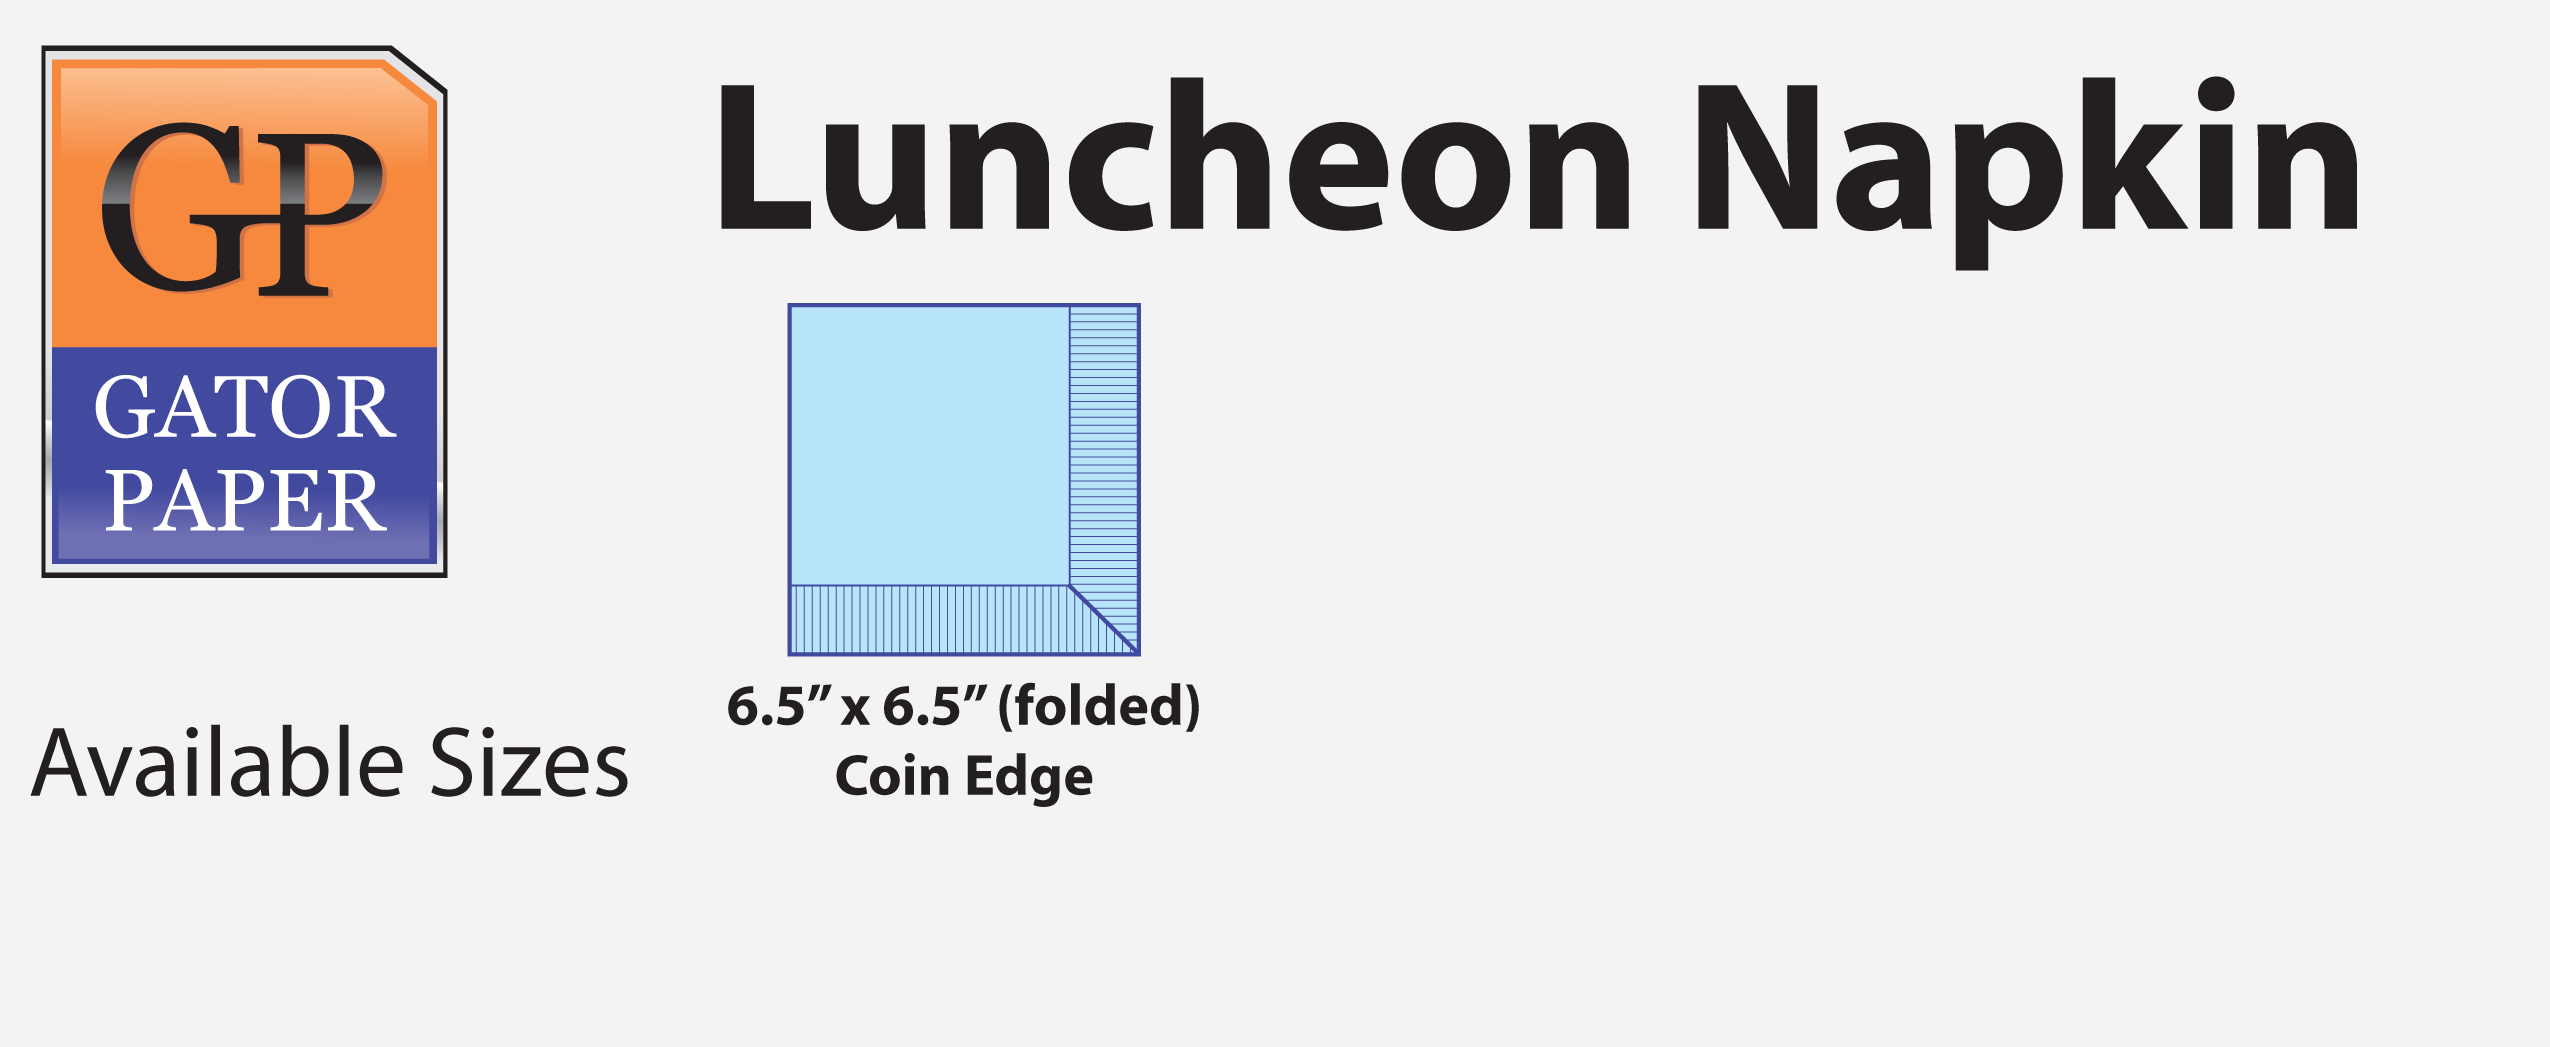 Custom Printed Luncheon Napkins